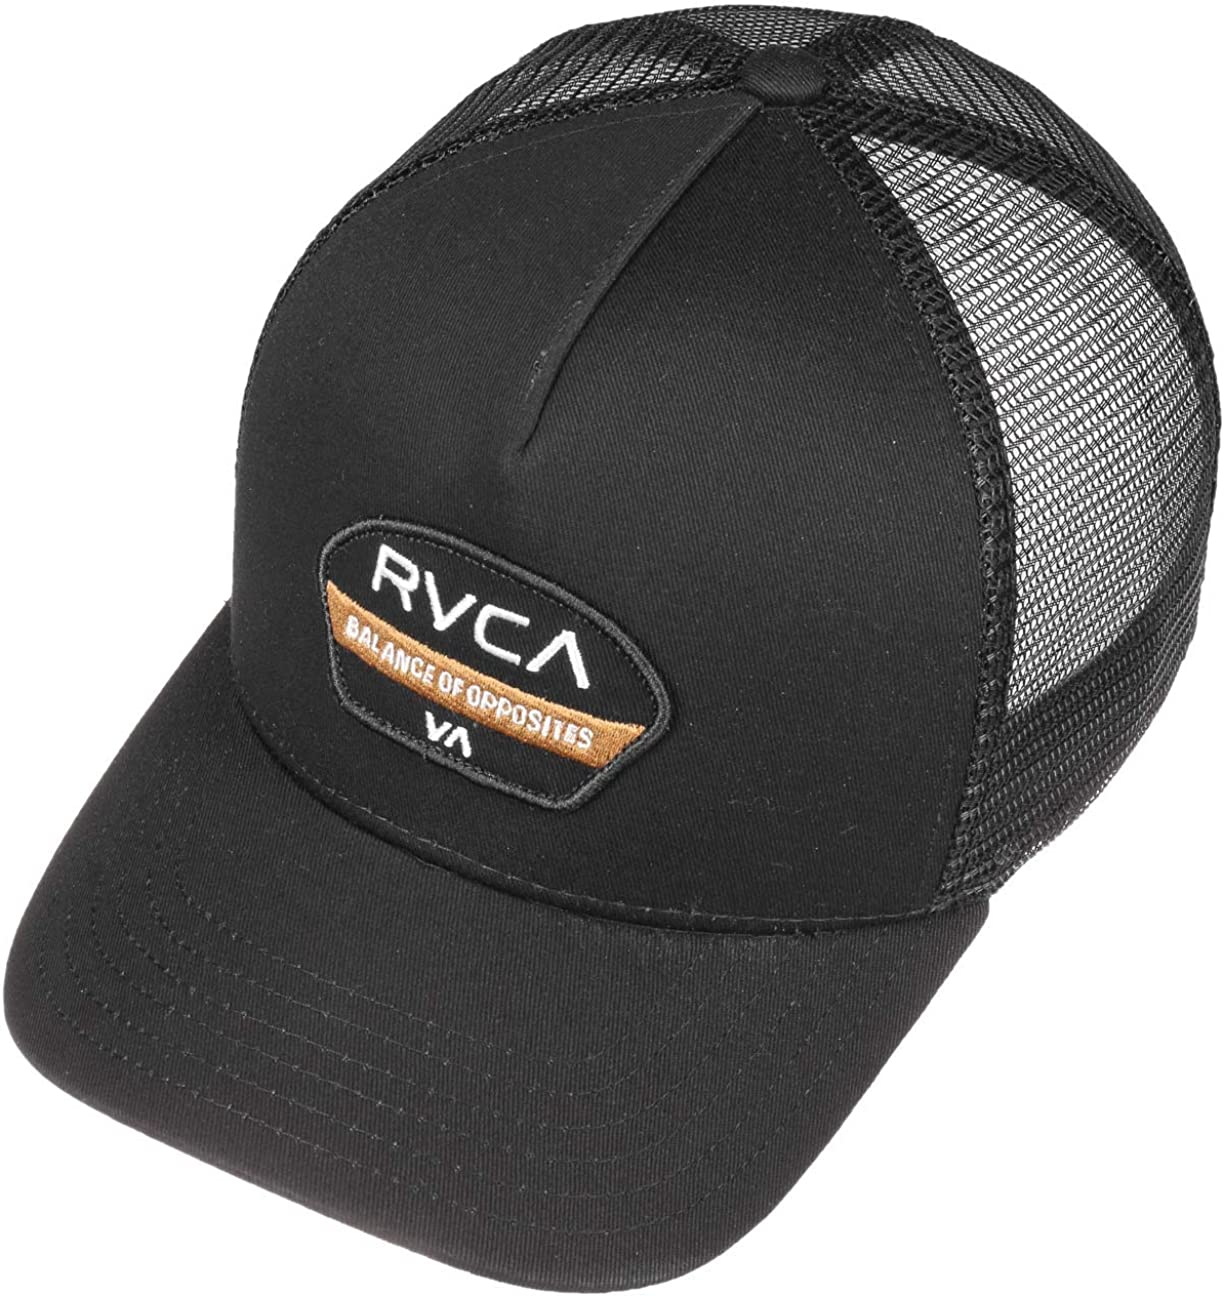 RVCA Gorra Balance of Opposites Trucker de Baseball Camionero ...